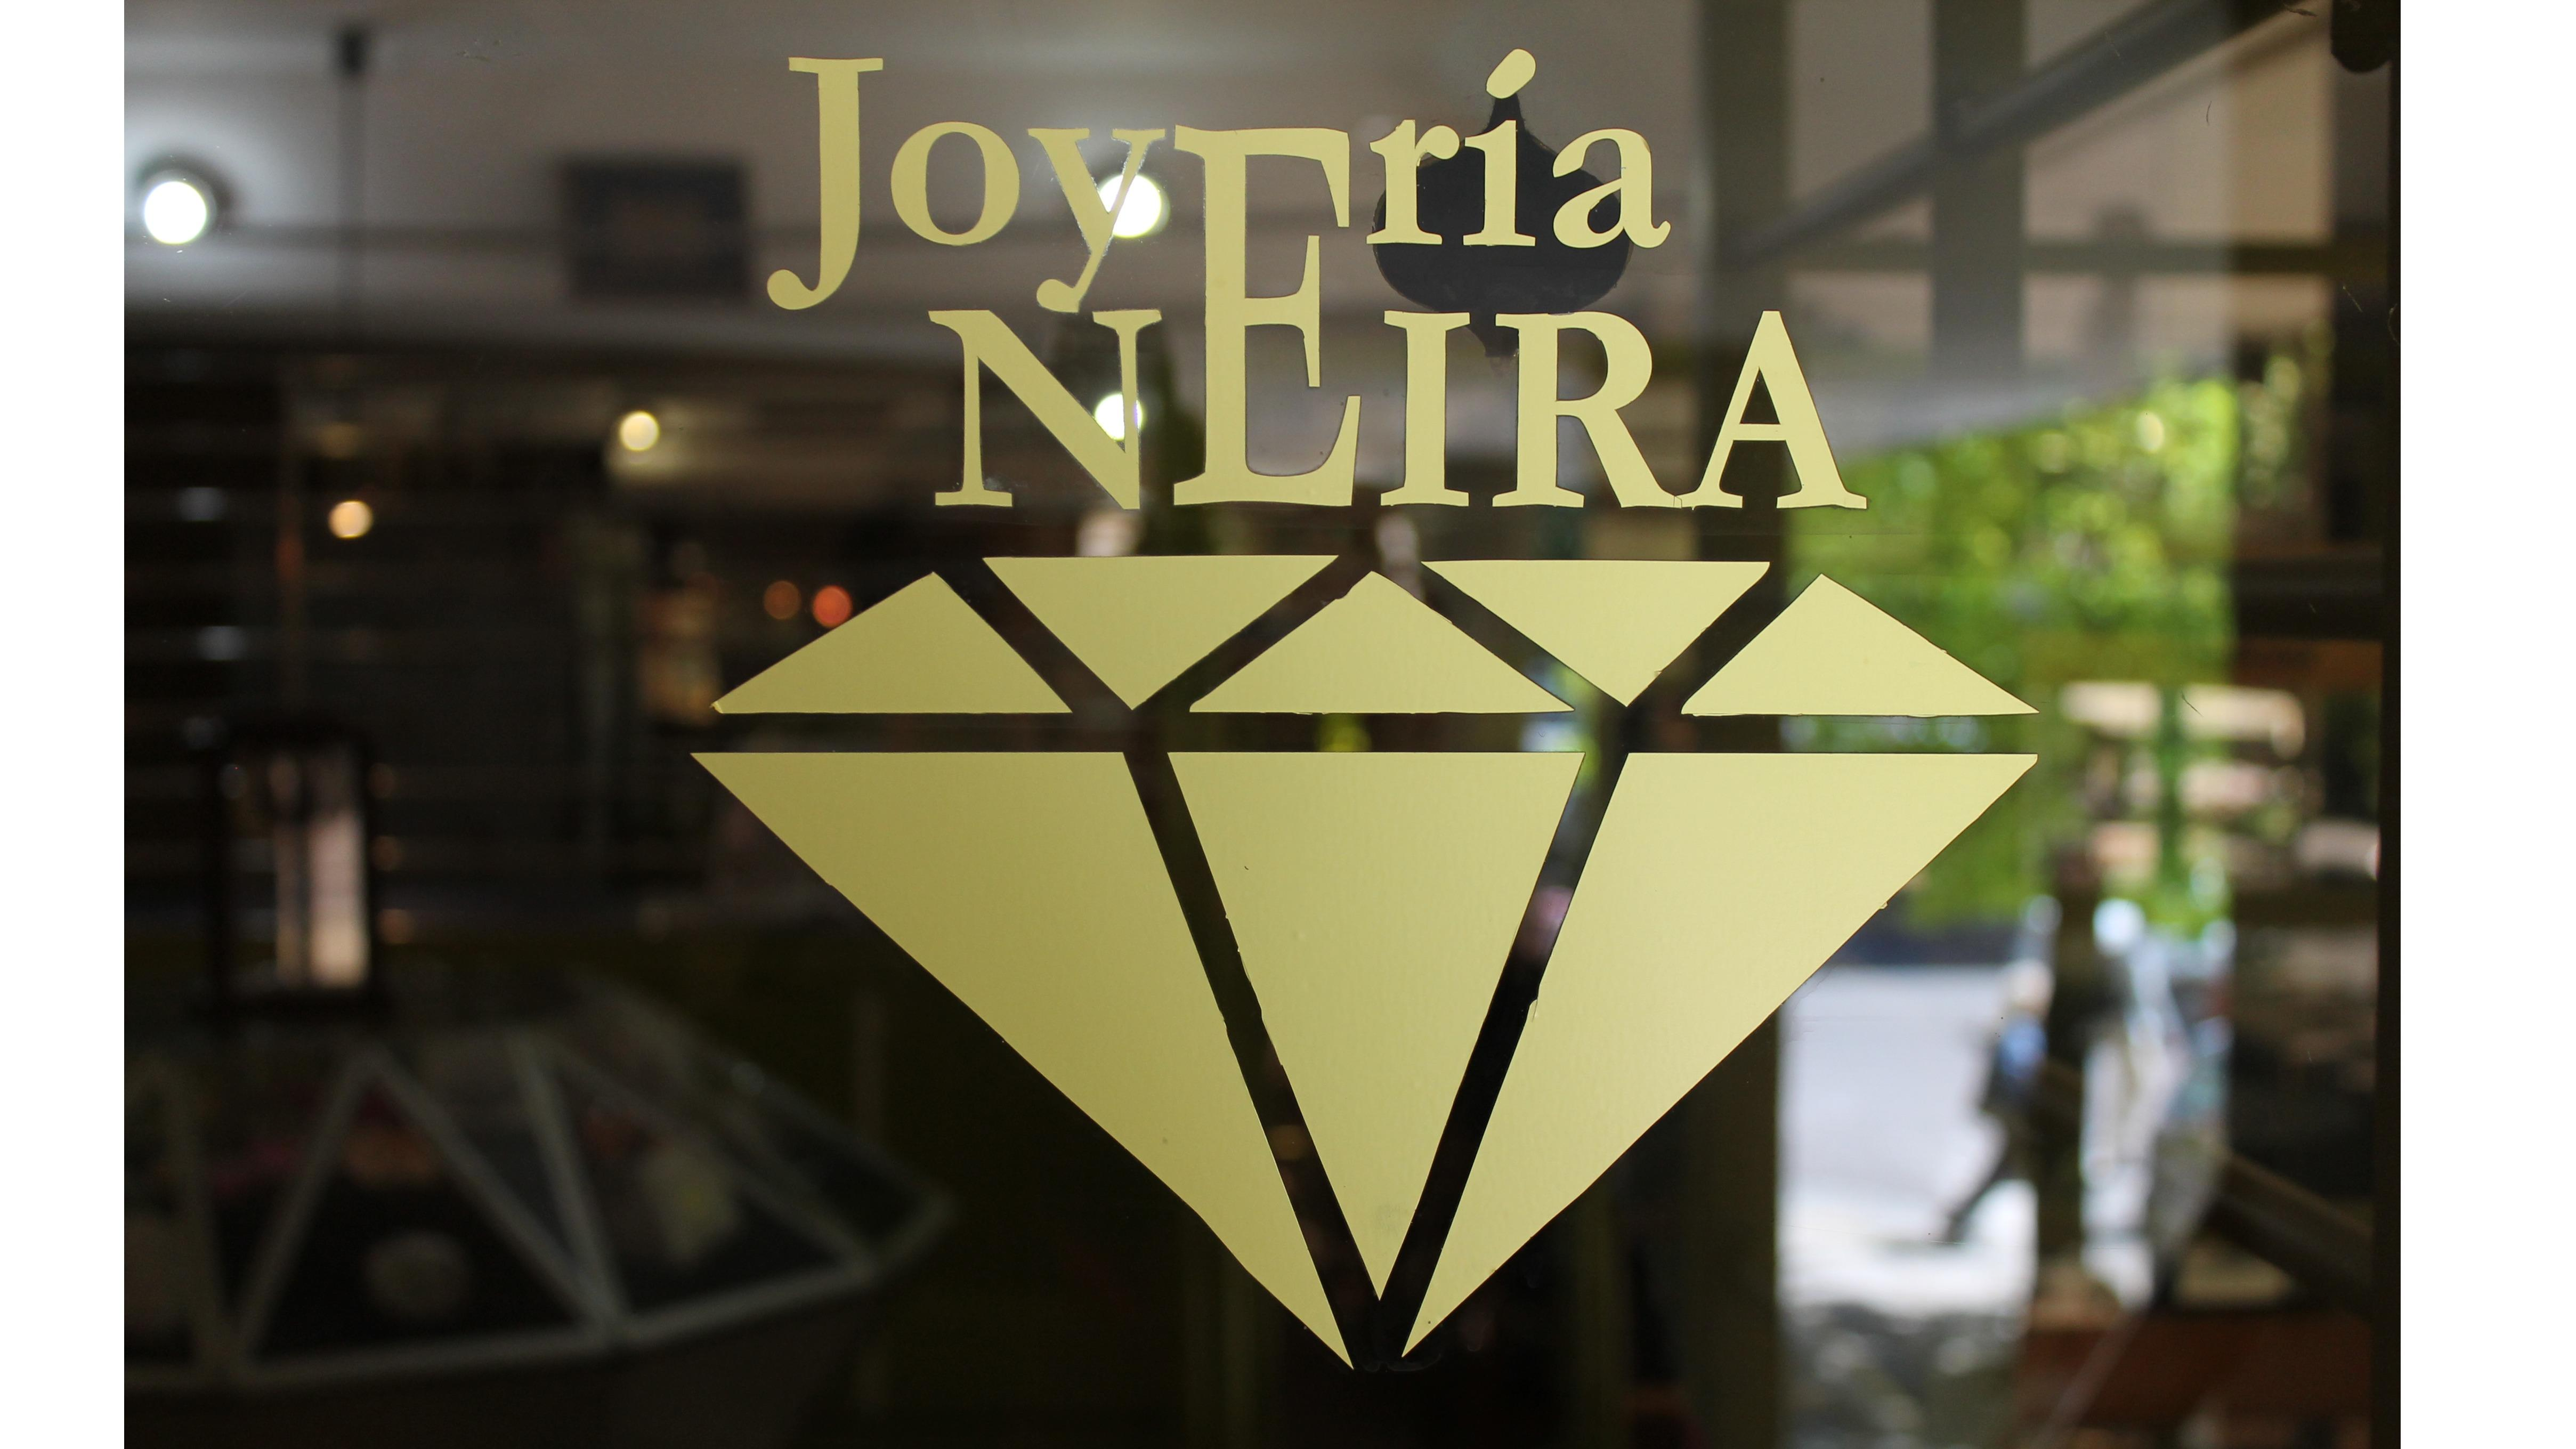 JOYERIA NEIRA